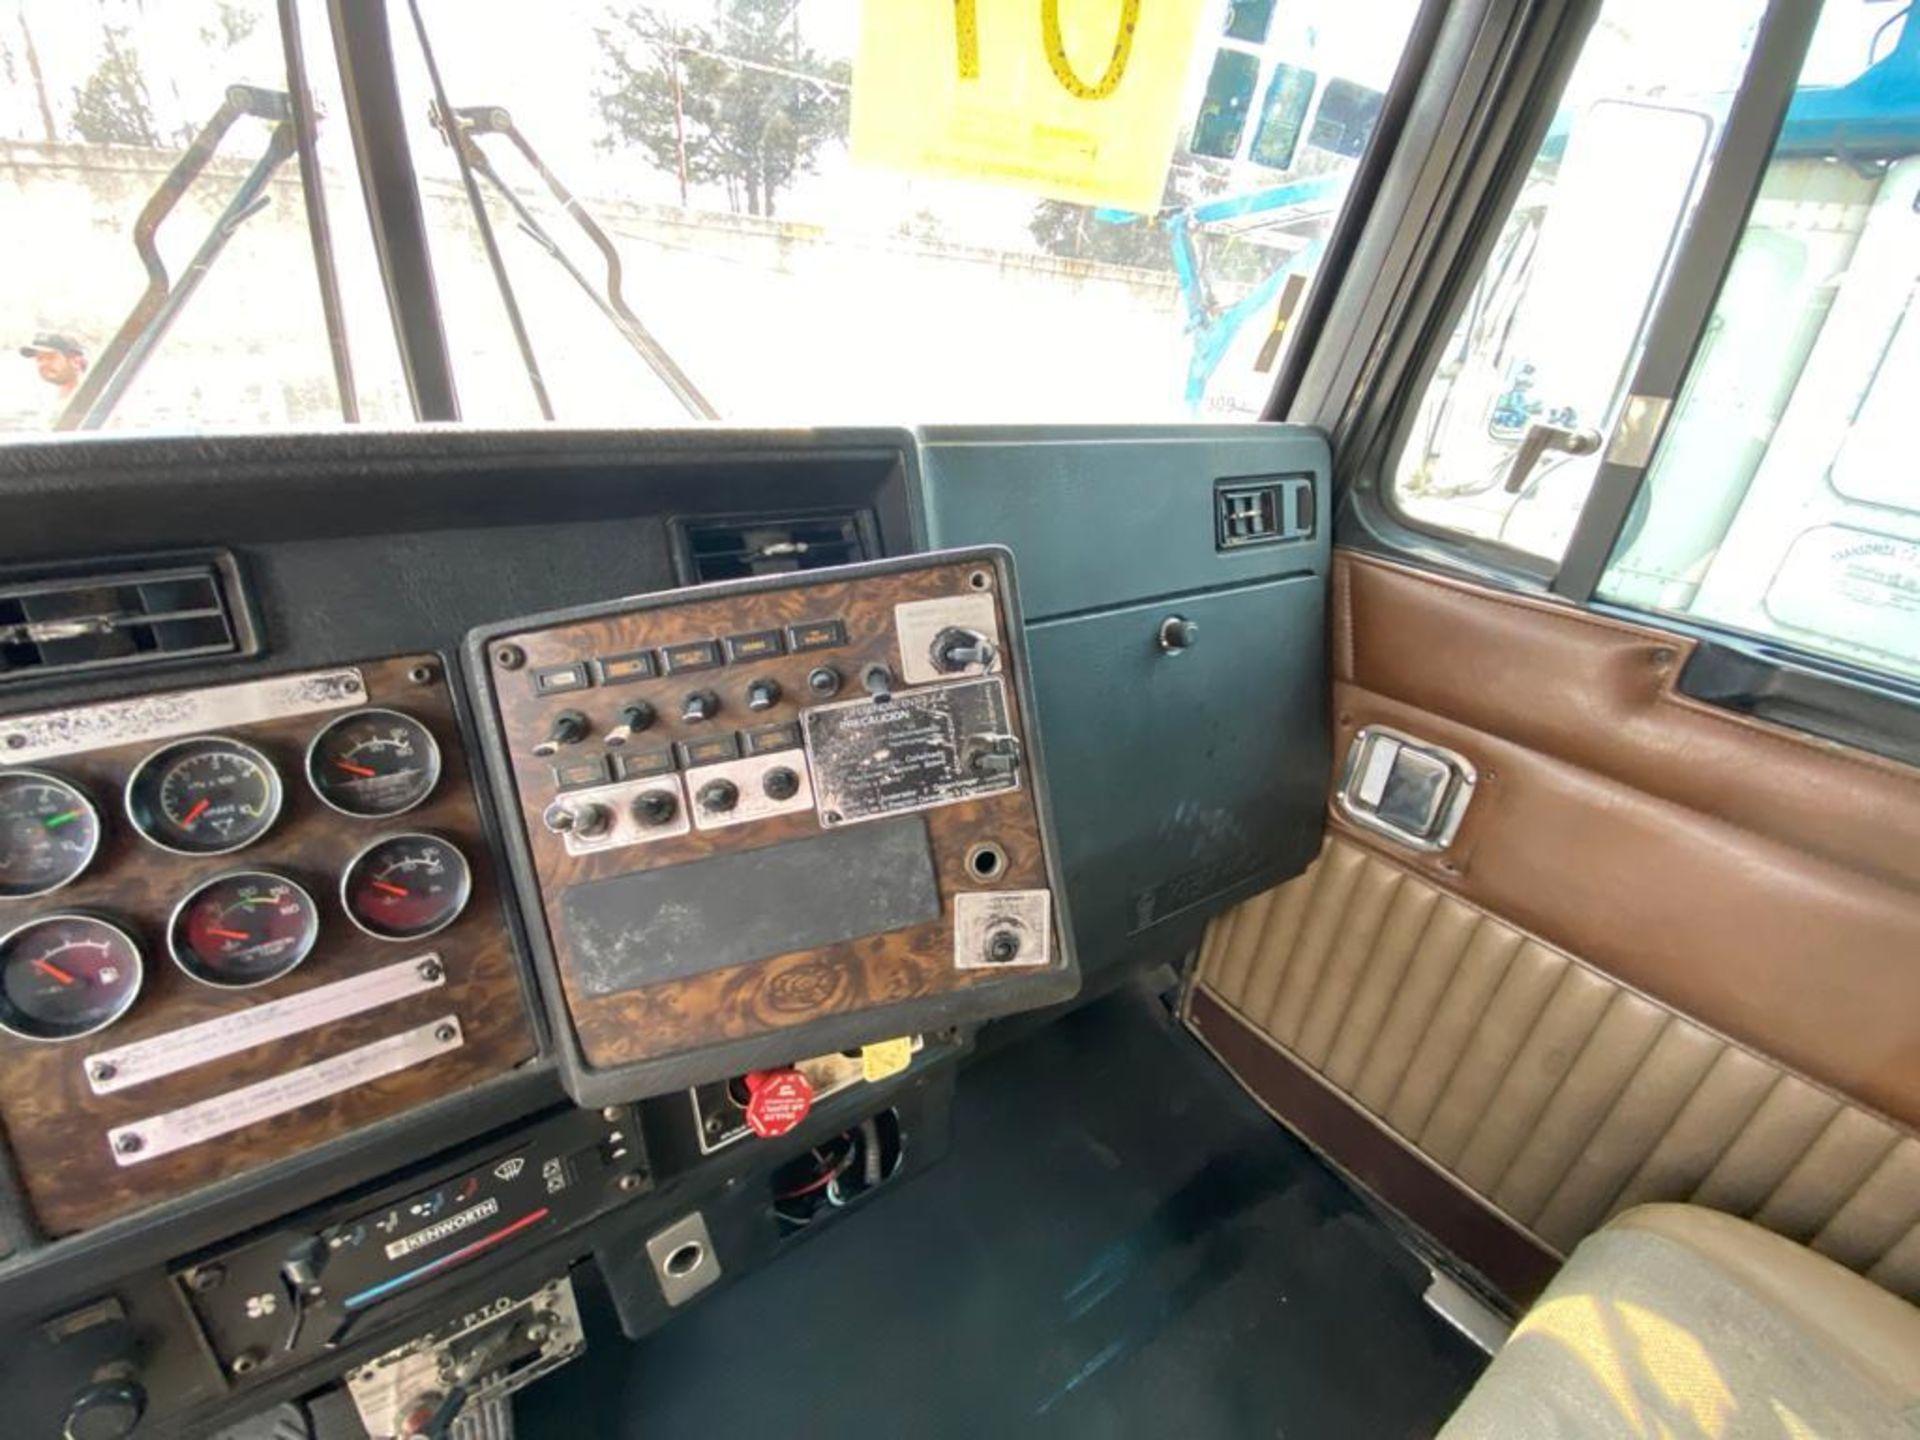 1999 Kenworth Sleeper truck tractor, standard transmission of 18 speeds - Image 35 of 72